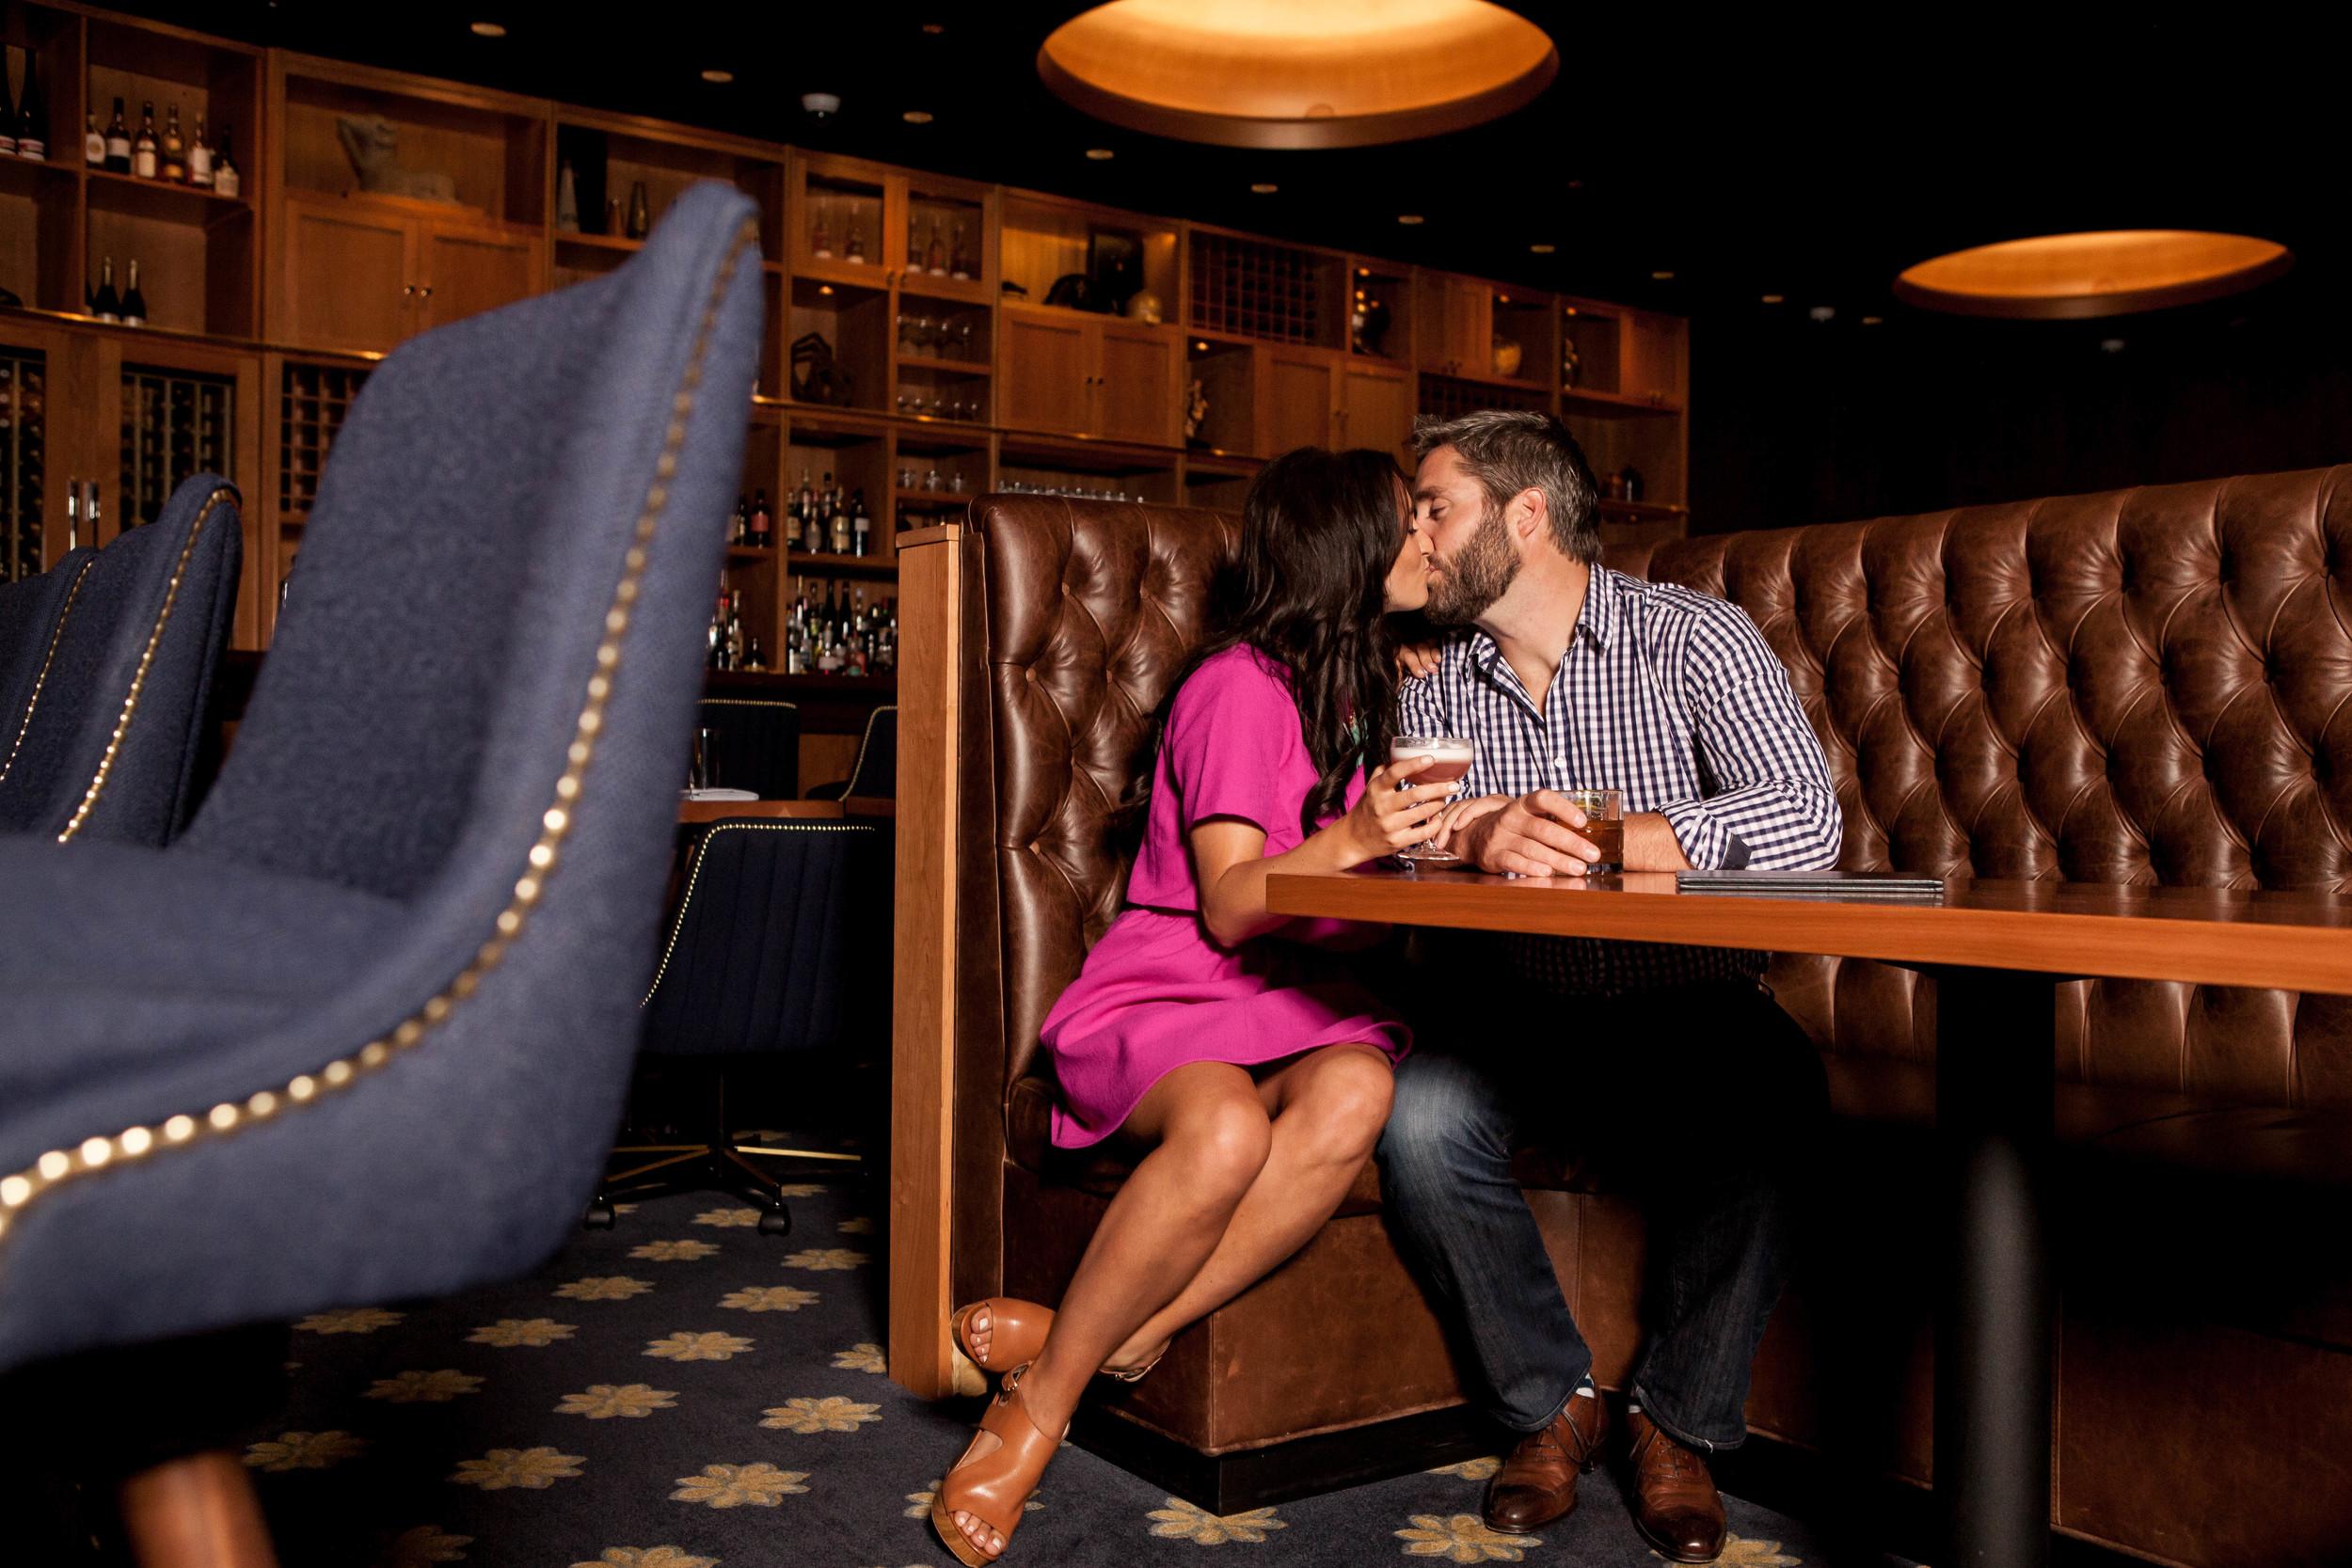 Sarah + Mike Engagement shoot Rose Photo Chicago Athletic Association Michigan Avenue Millenium Park  -003-2.jpg